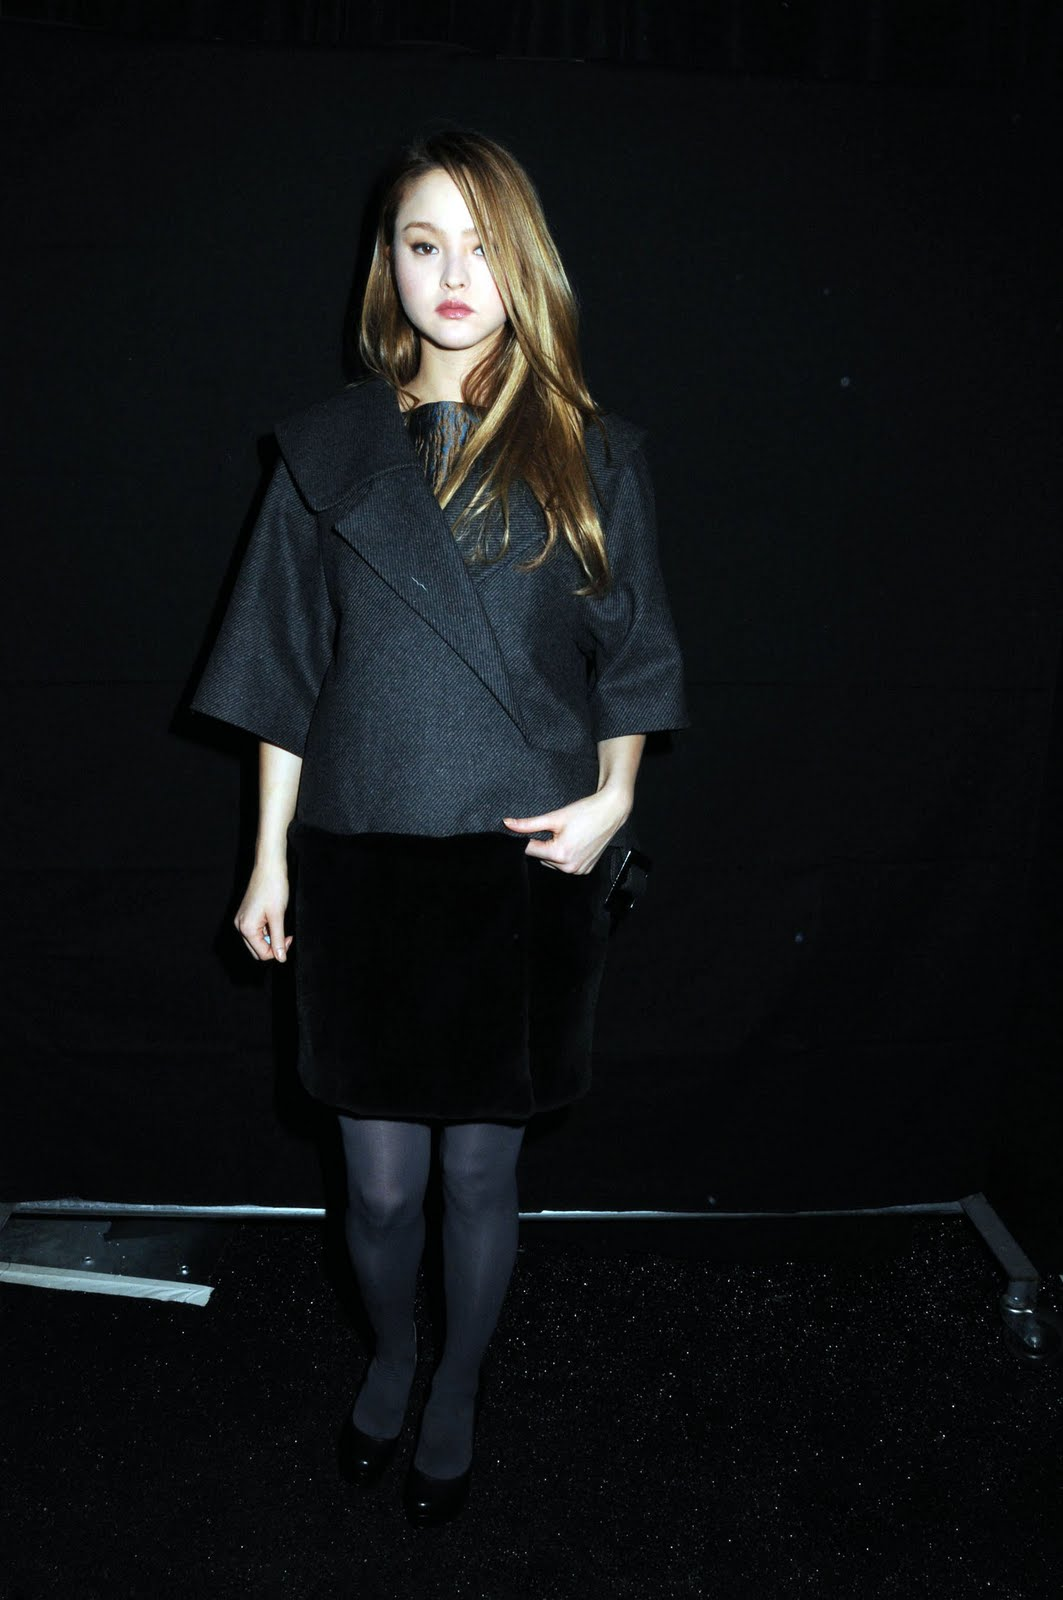 http://1.bp.blogspot.com/_jcLmI_ZzqII/TTMWeiFdRyI/AAAAAAAAAhE/Dic9B3XqbPI/s1600/Devon+Aoki+7.jpg